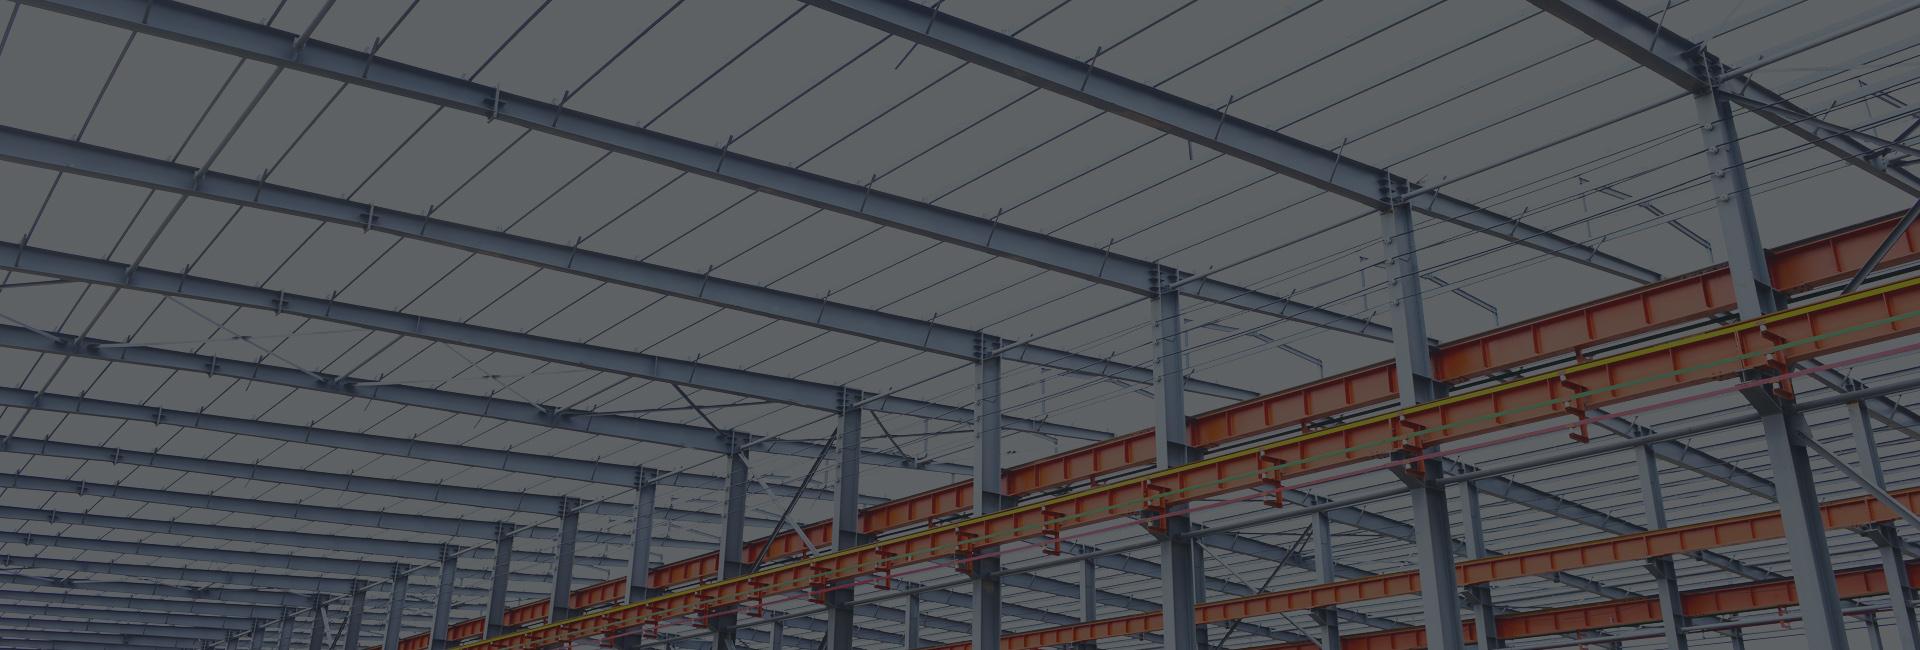 Home | Oklahoma Steel Building Systems, Inc  | (405) 833 - 6392